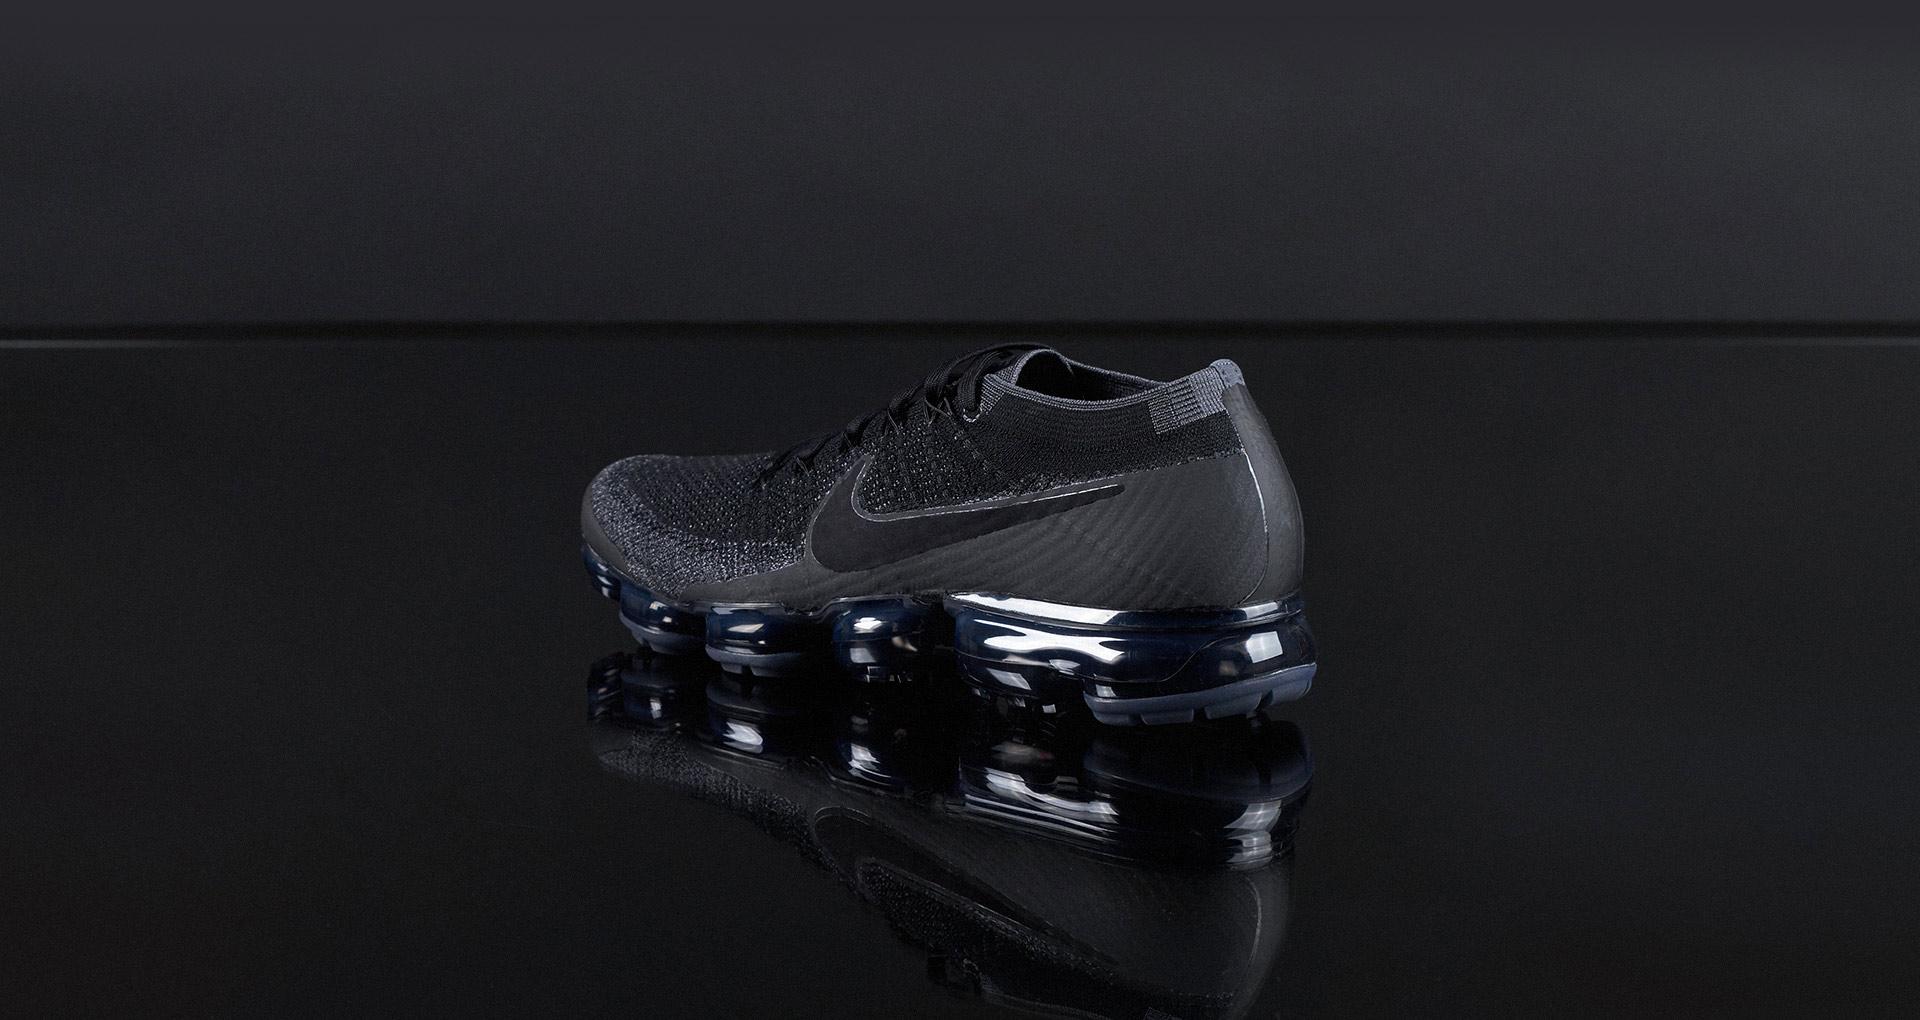 6 Days 6 Sneakers 1 Air VaporMax